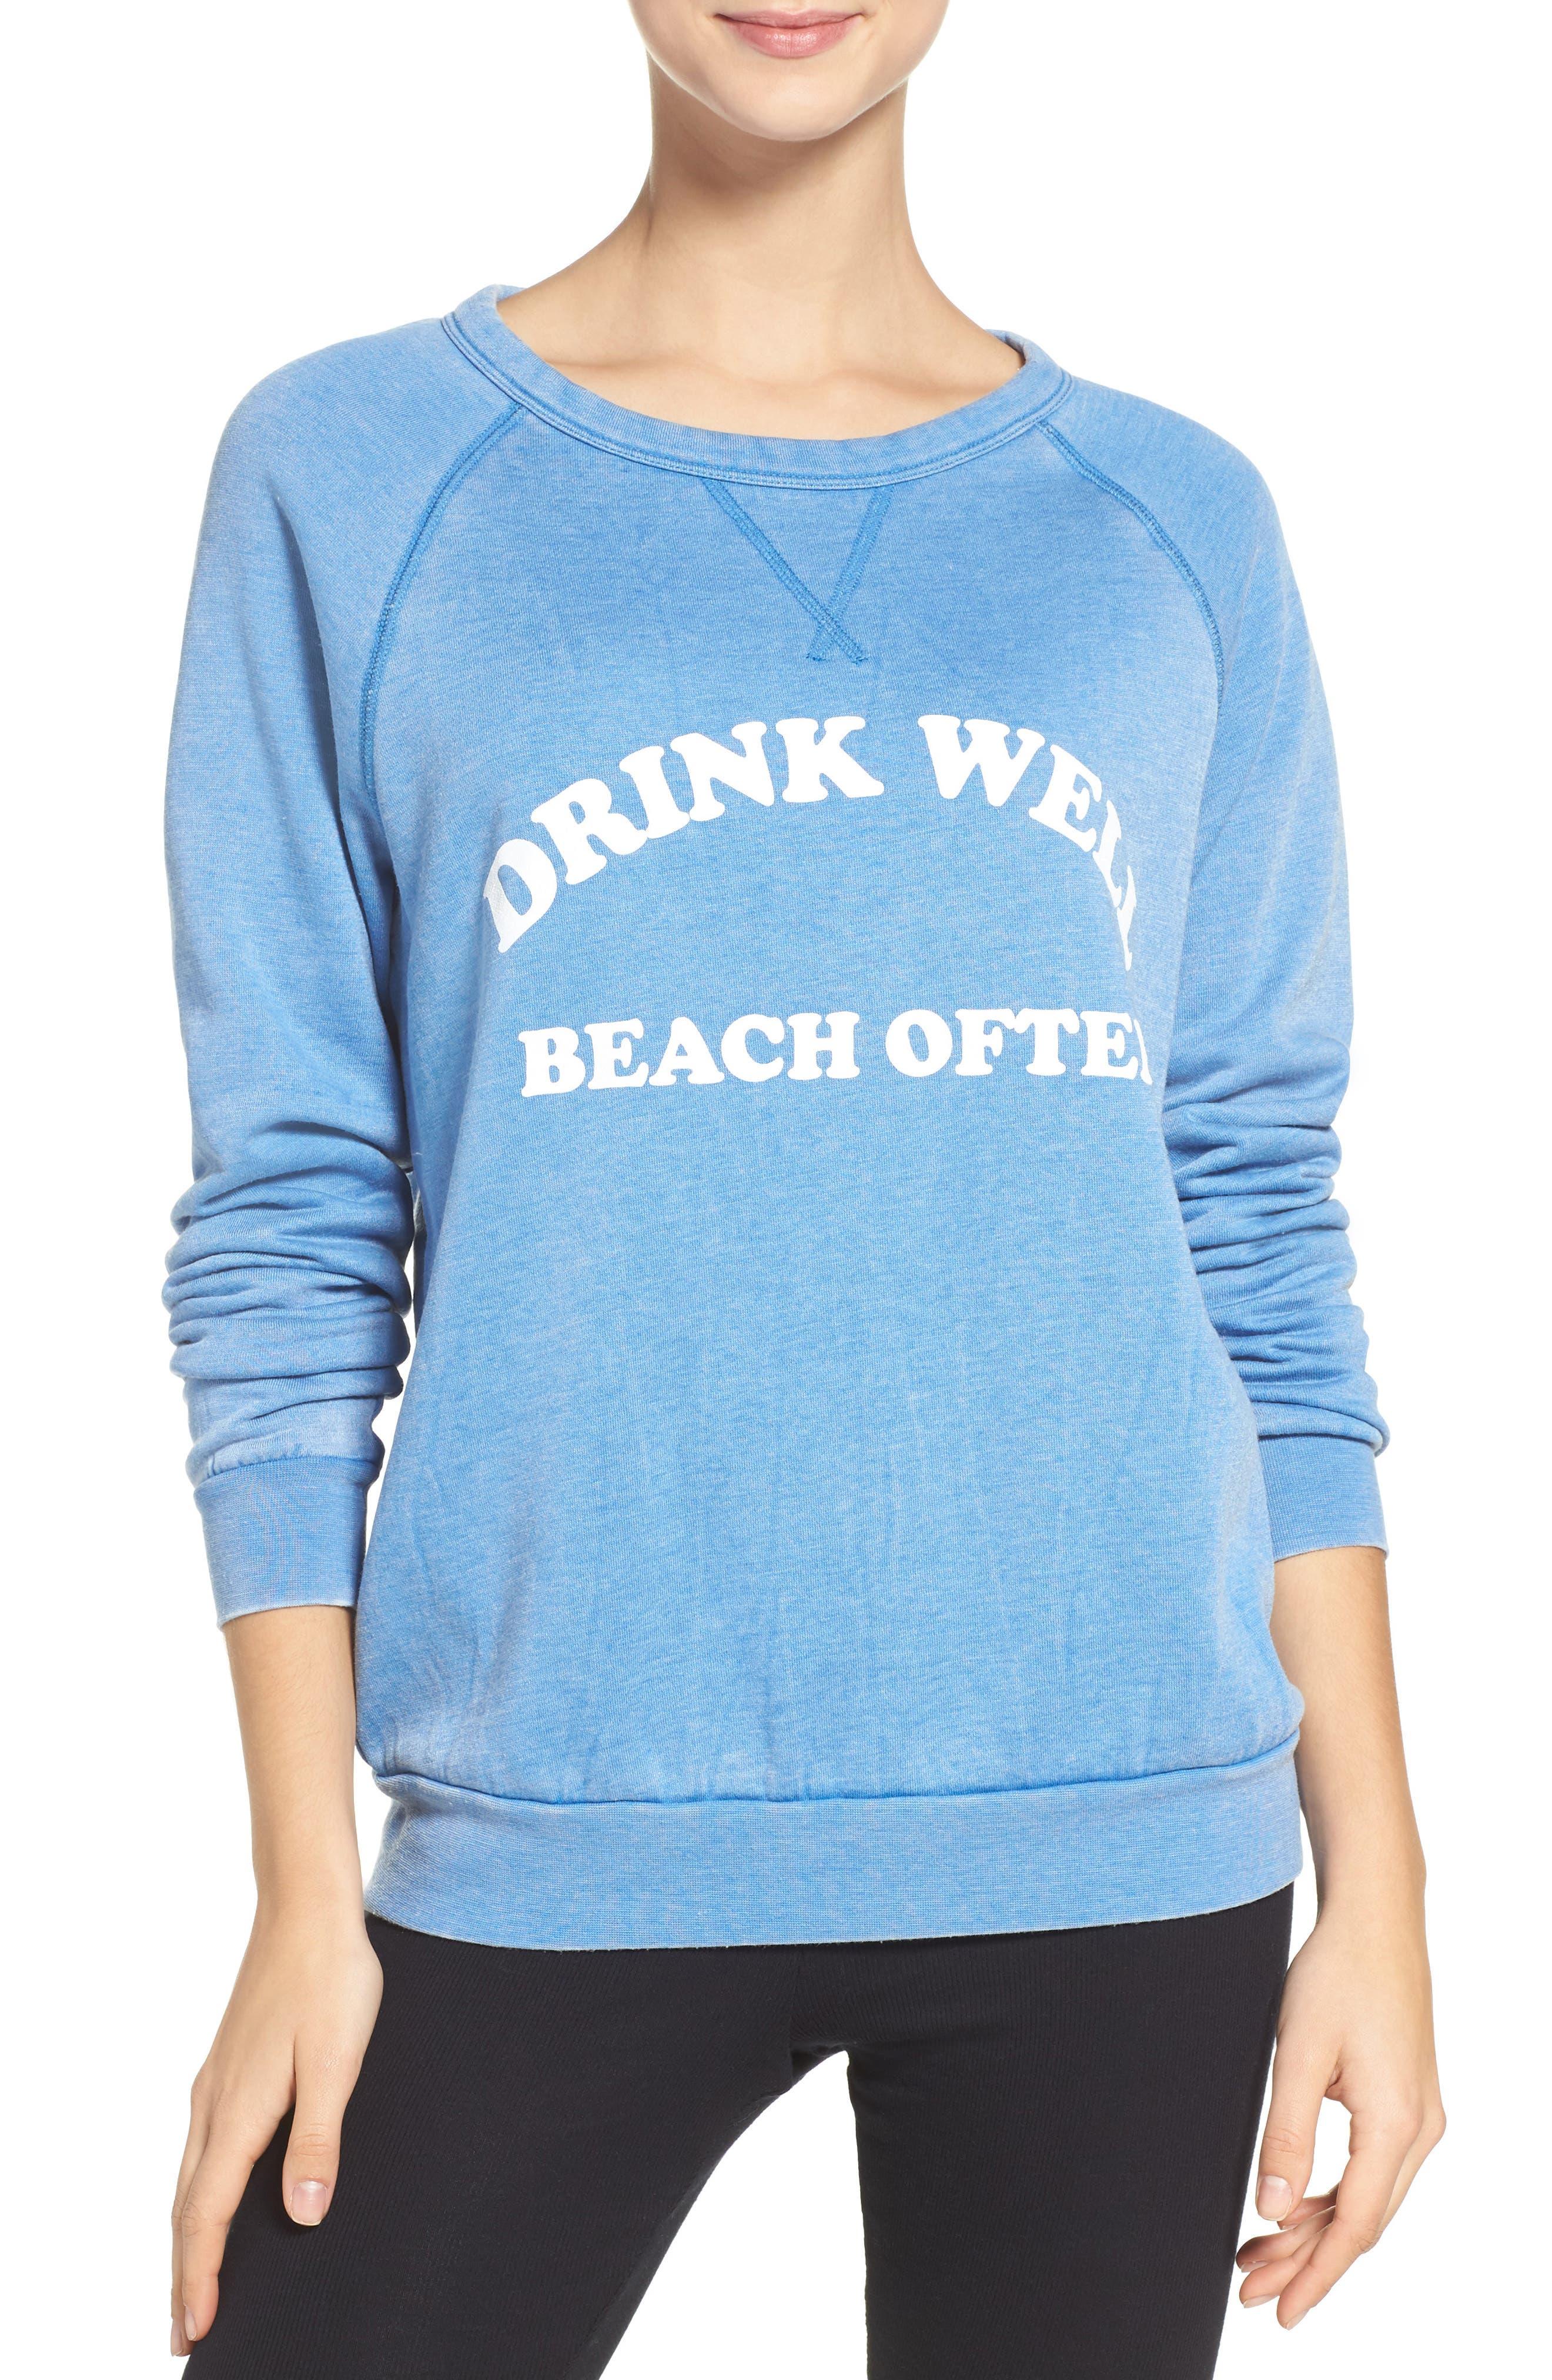 Drink Well Beach Often Sweatshirt,                             Main thumbnail 1, color,                             Deep Blue